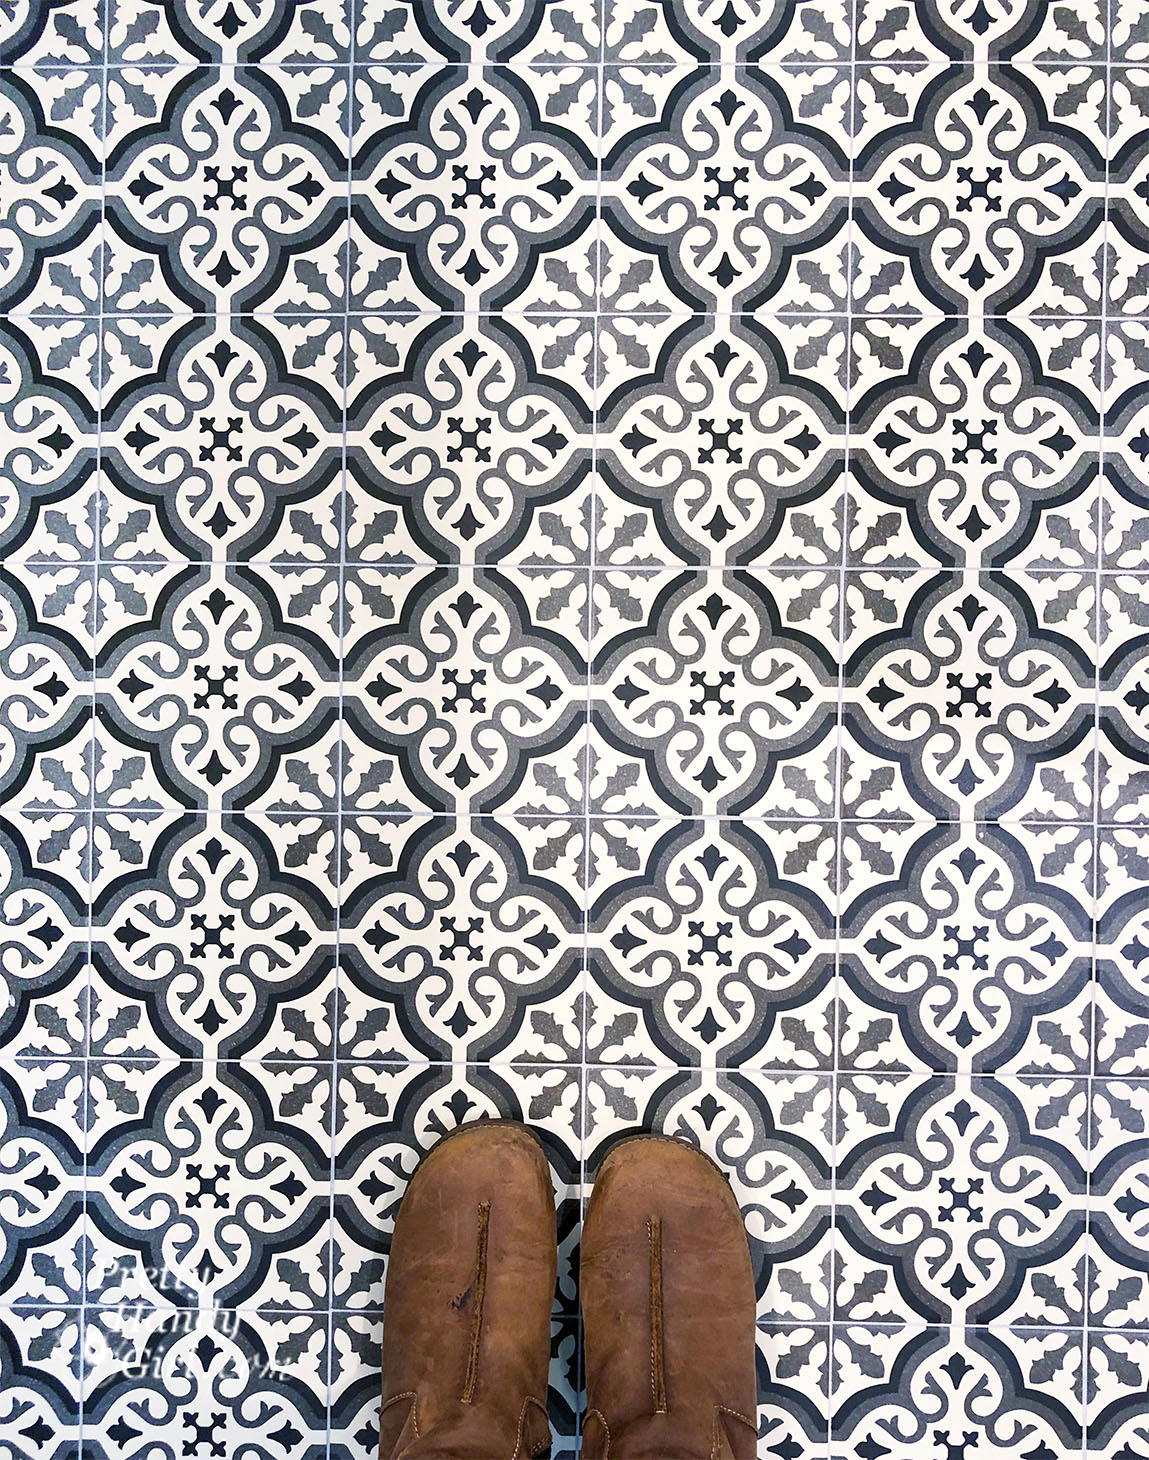 Cement Tile Look Alike on Bathroom Floor